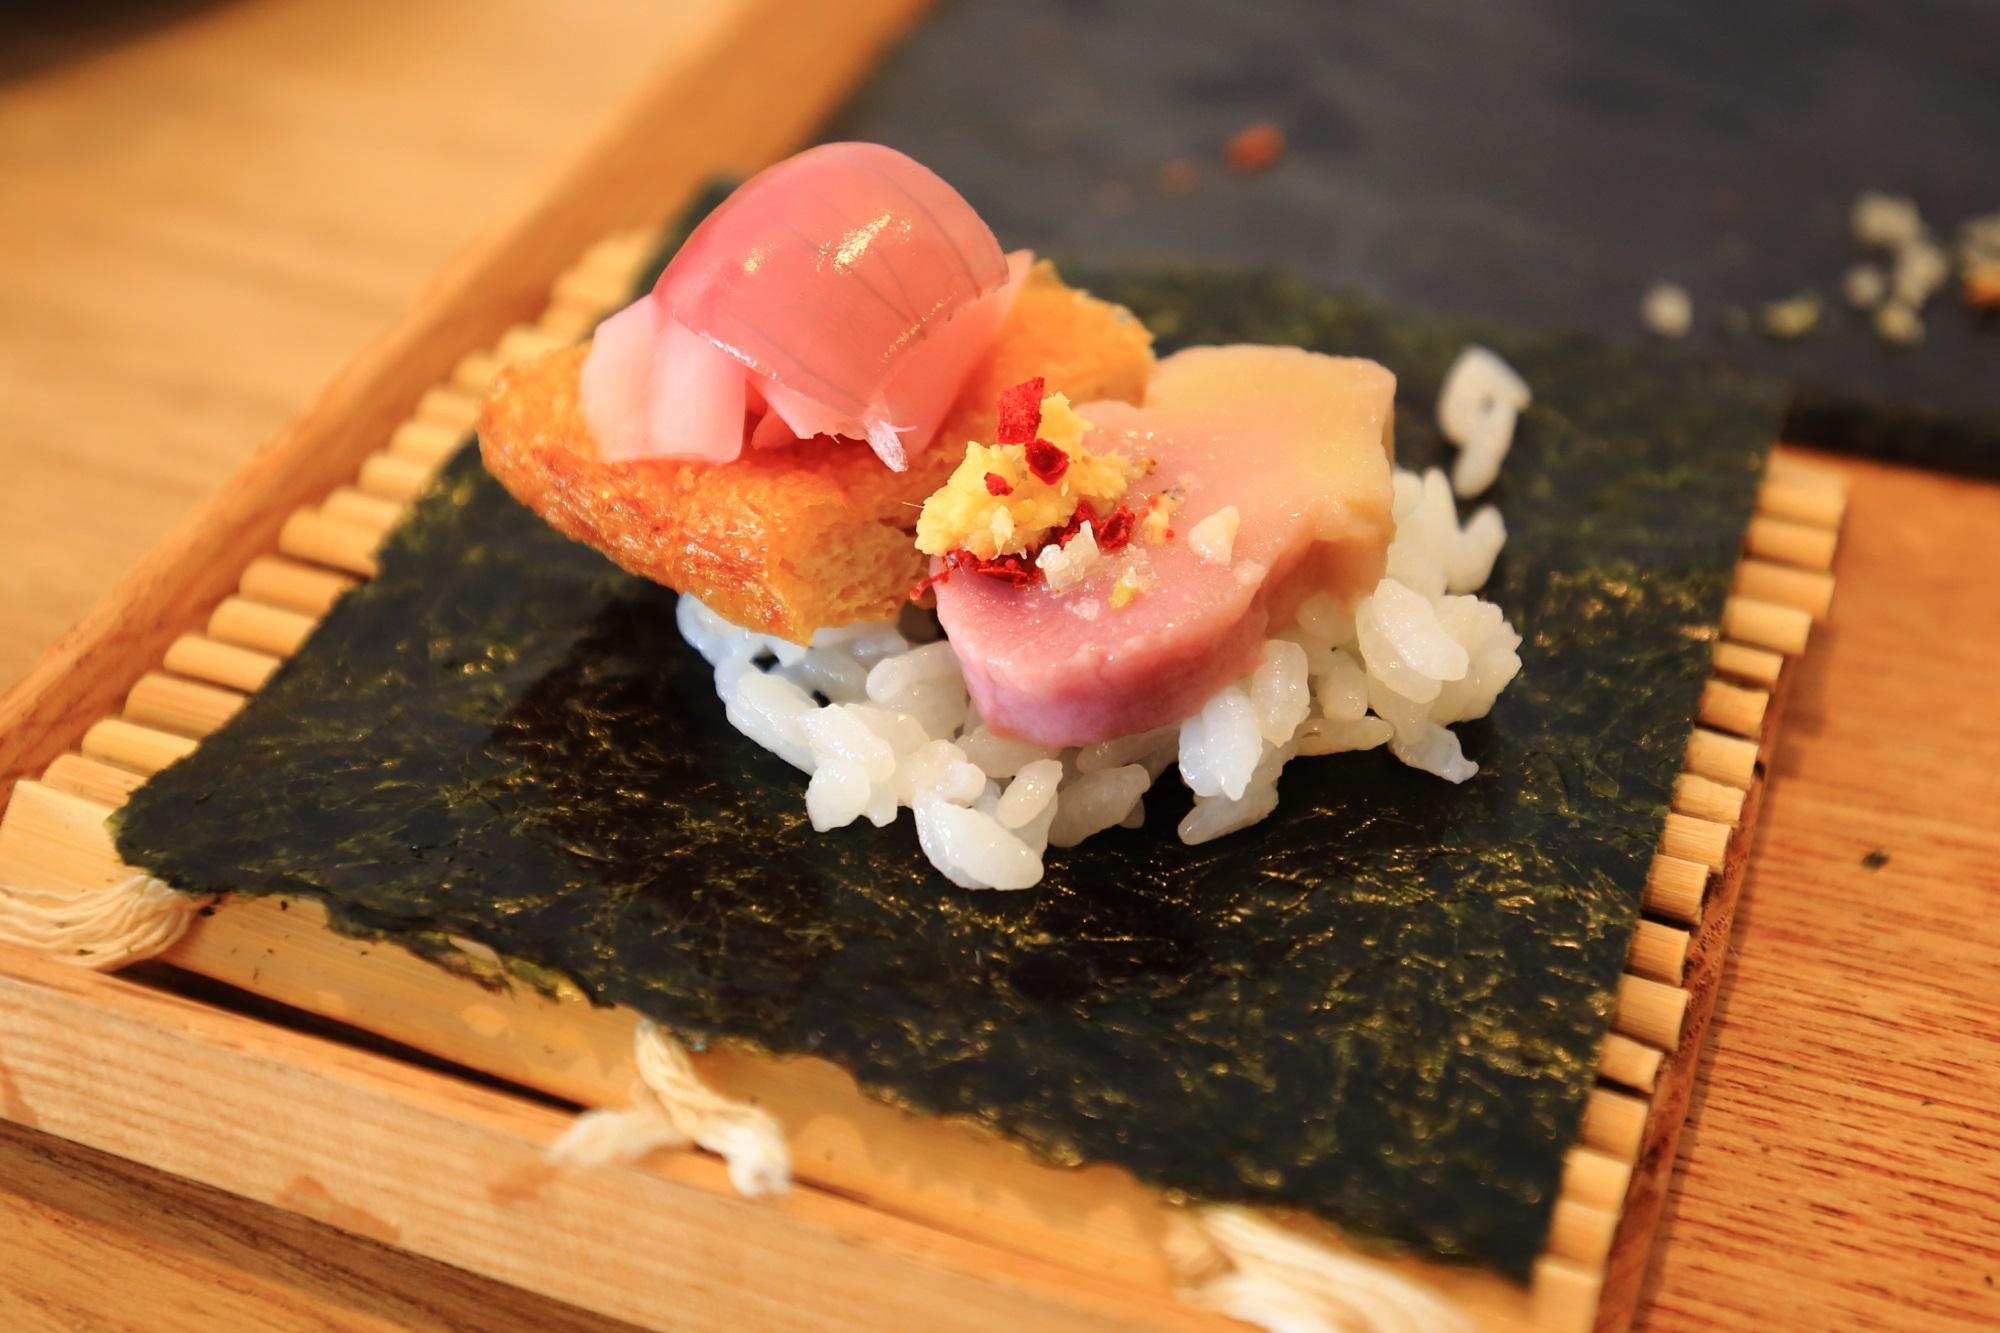 AWOMB (アウーム) 美しく芸術的な手巻き寿司